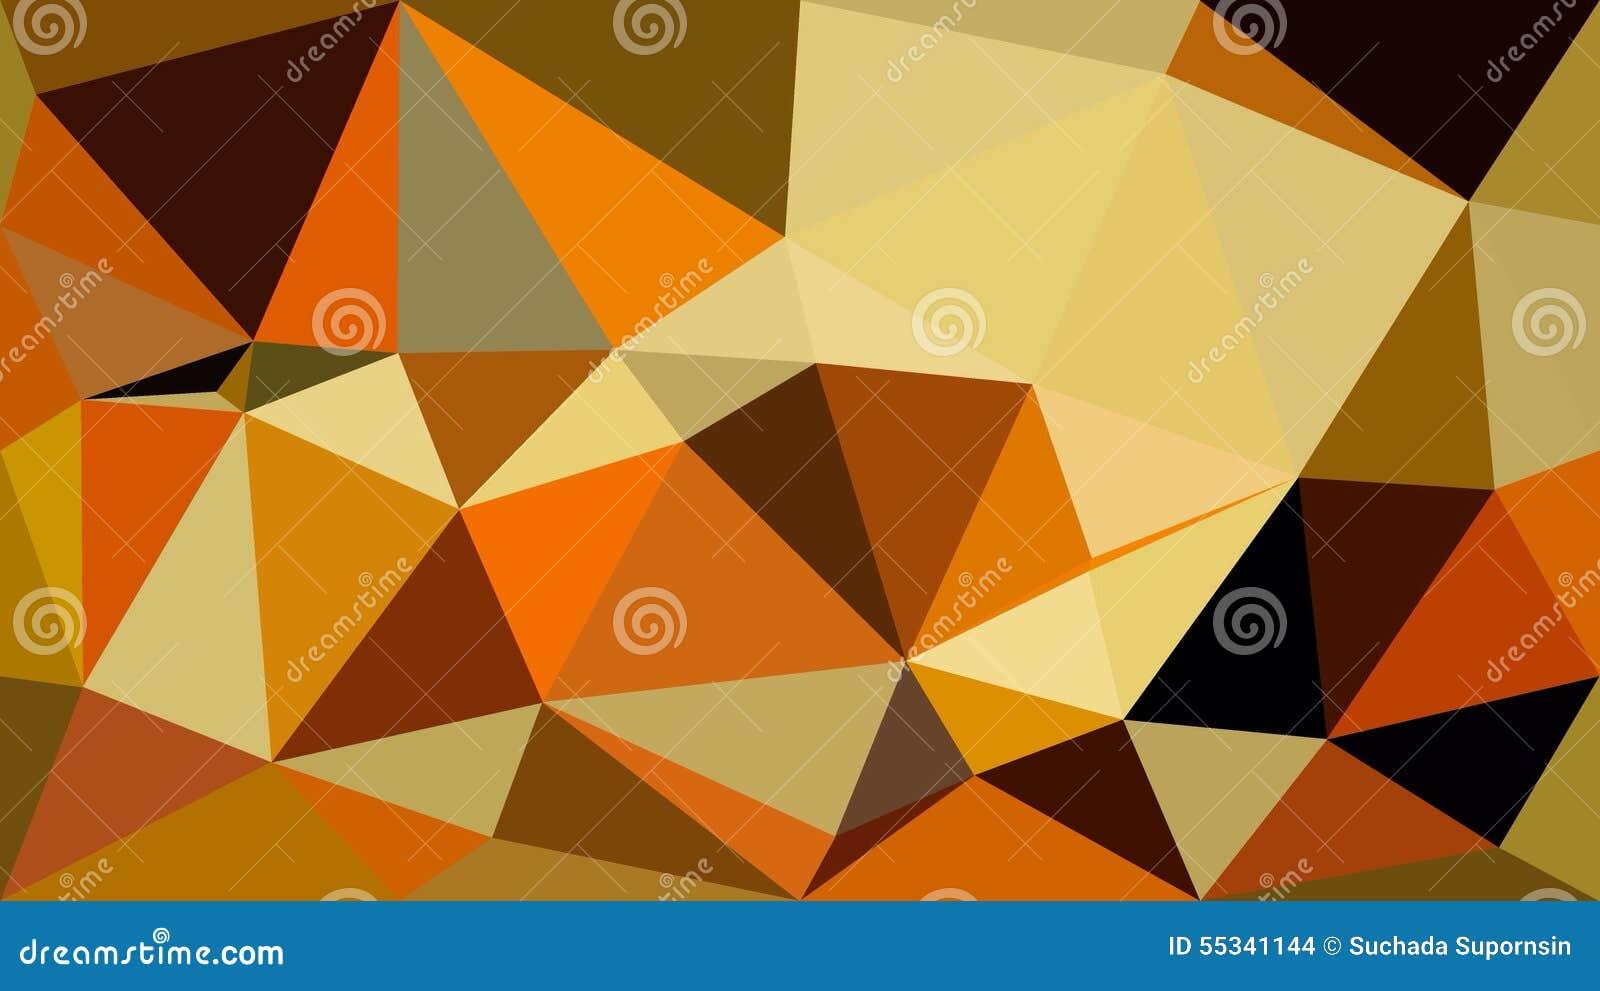 triangle orange white black polygon wallpaper background 55341144